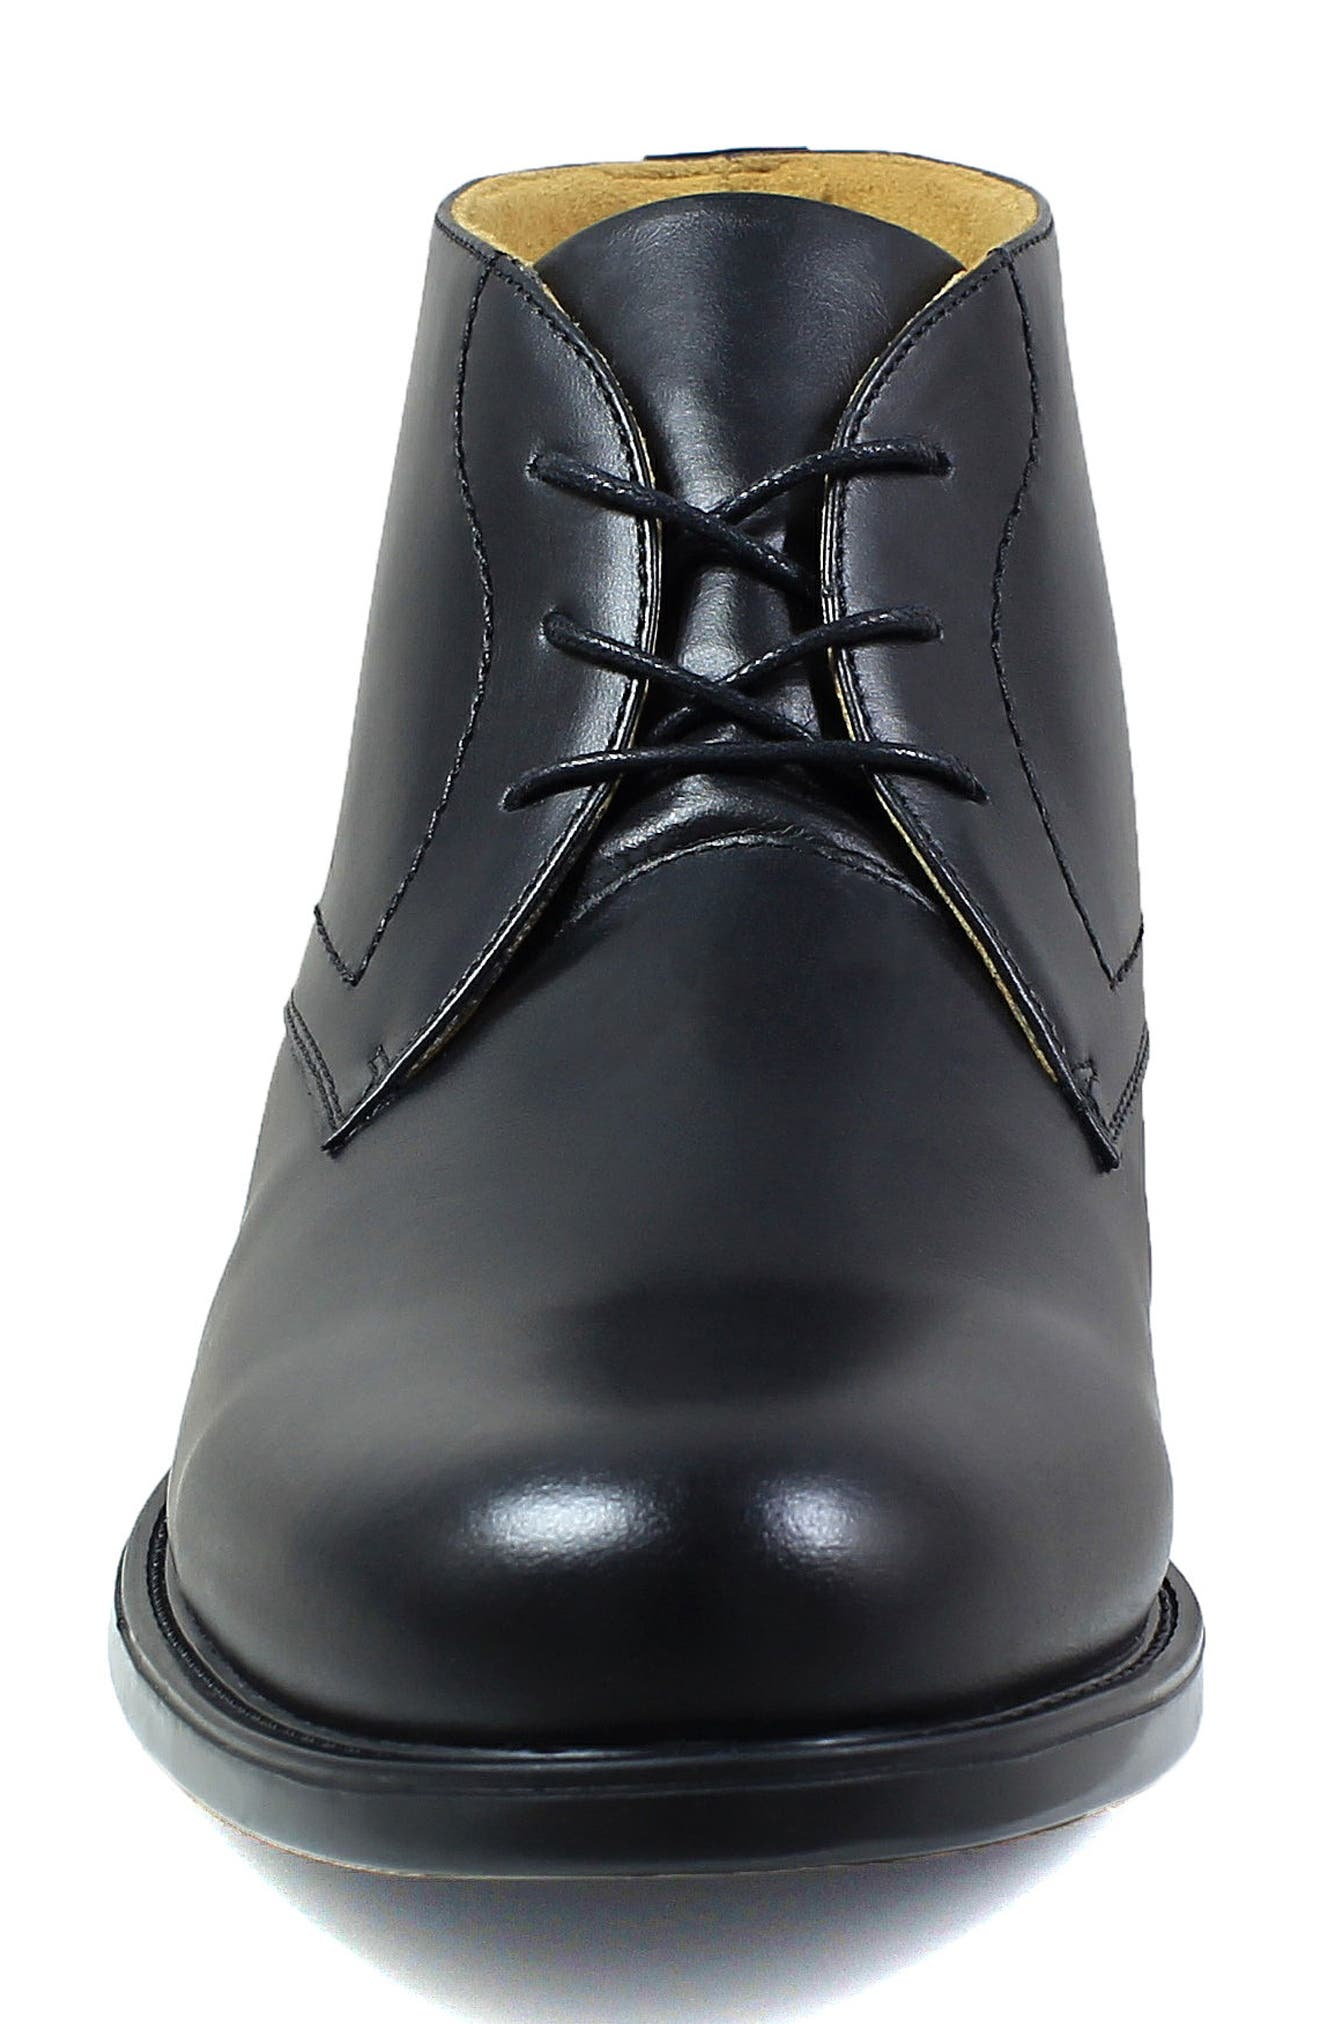 Midtown Waterproof Chukka Boot,                             Alternate thumbnail 4, color,                             BLACK